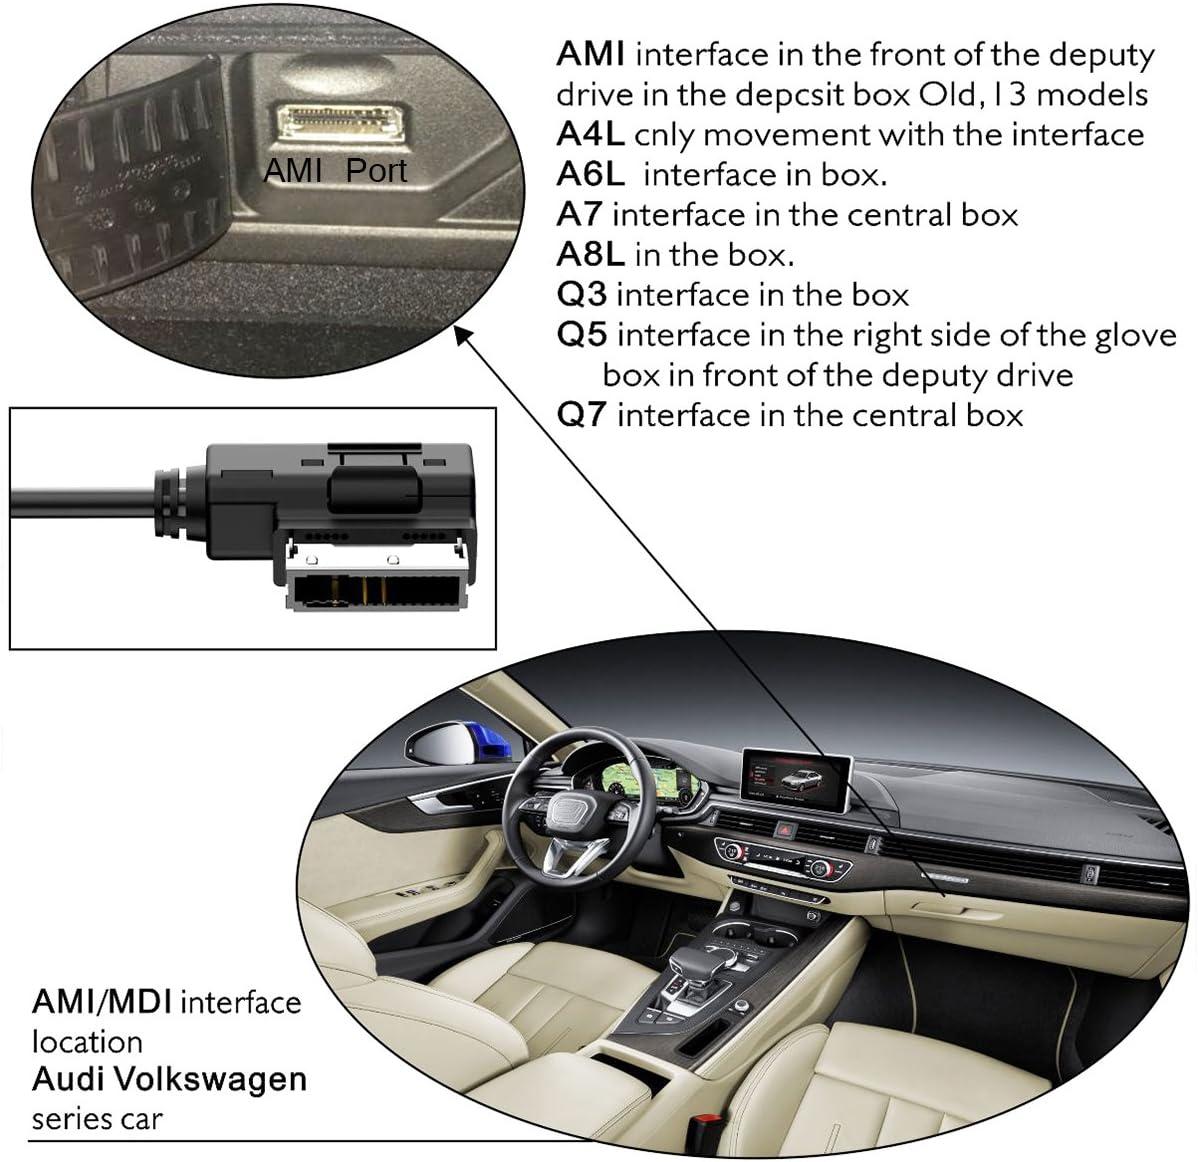 chelink Ami MMI USB-Anschluss Audio-Kabel f/ür Audi A3/A4/S4/A6/S6/A8/Q5/Q7/R8/TT Volkswagen Jetta GTI GLI Passat CC Tiguan Touareg EOS